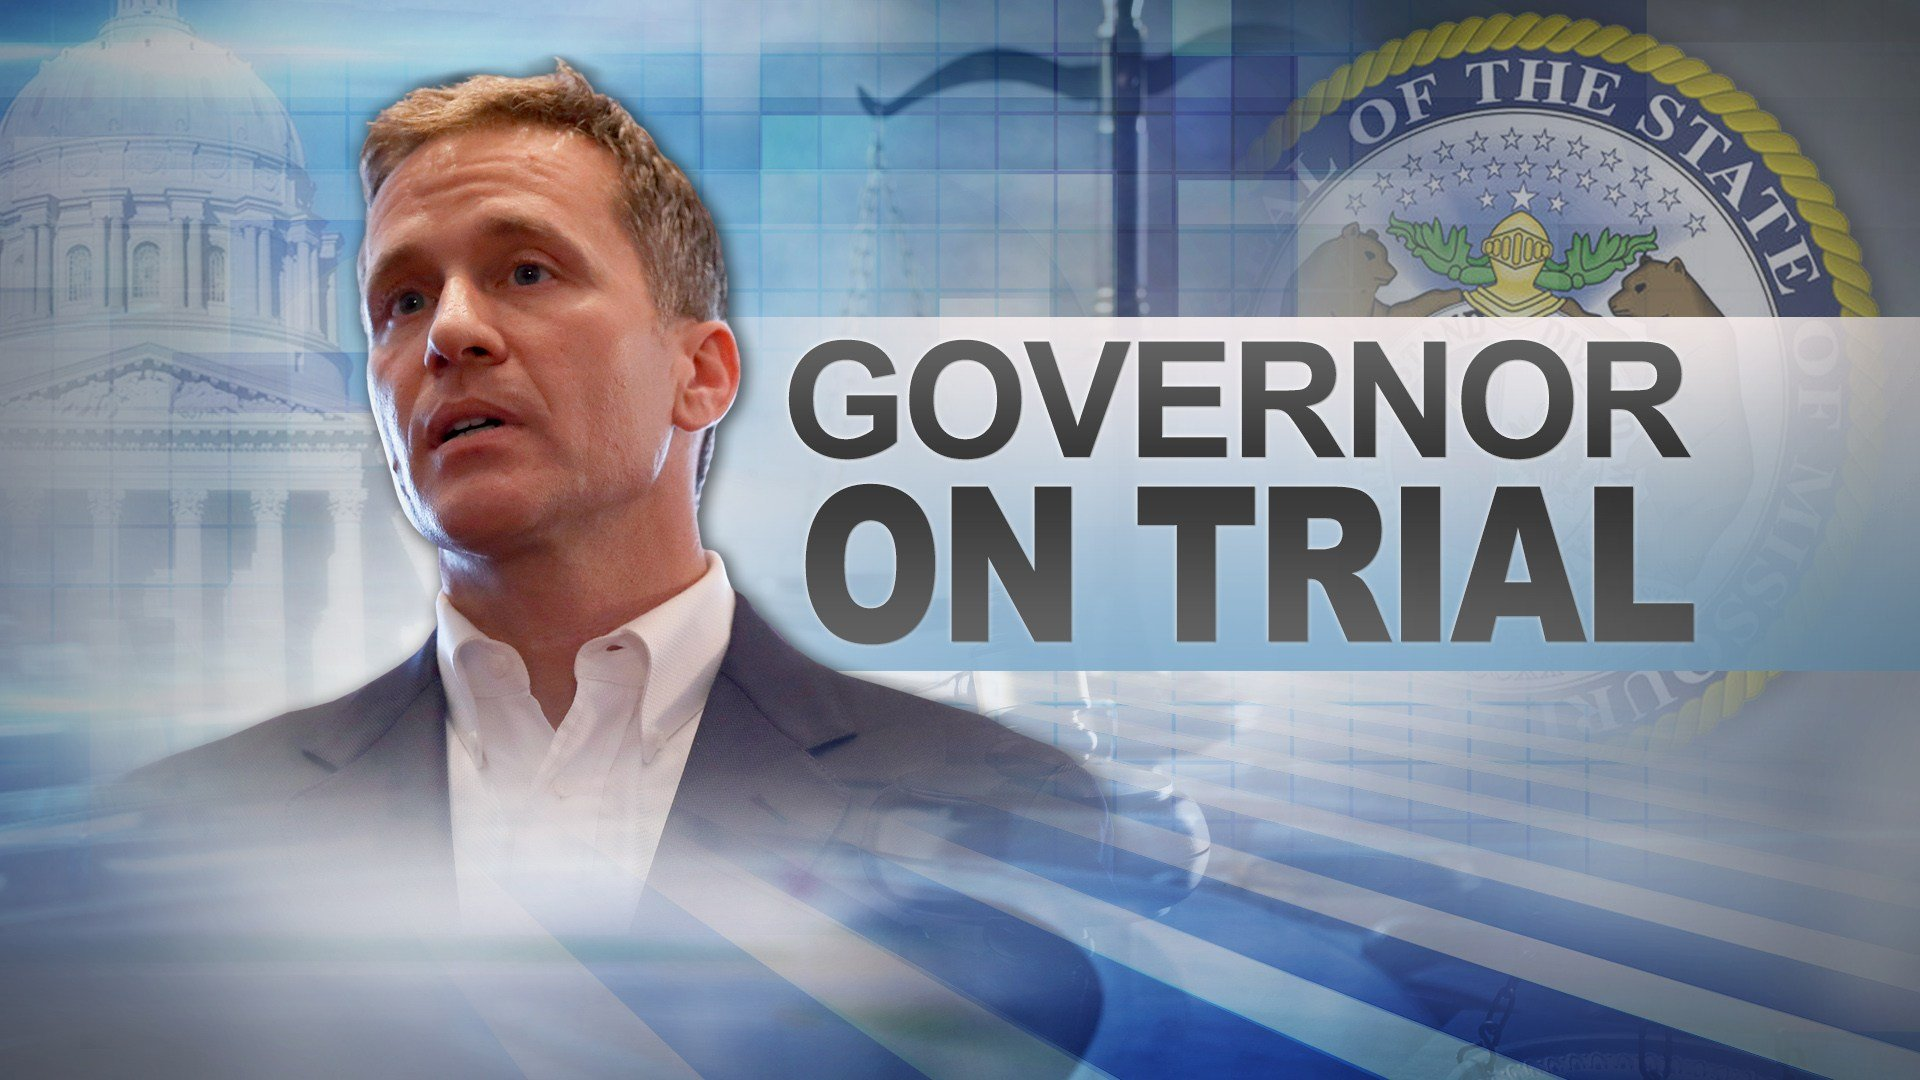 Jury selection begins Thursday for Gov. Eric Greitens' felony invasion of privacy trial. (KCTV5)